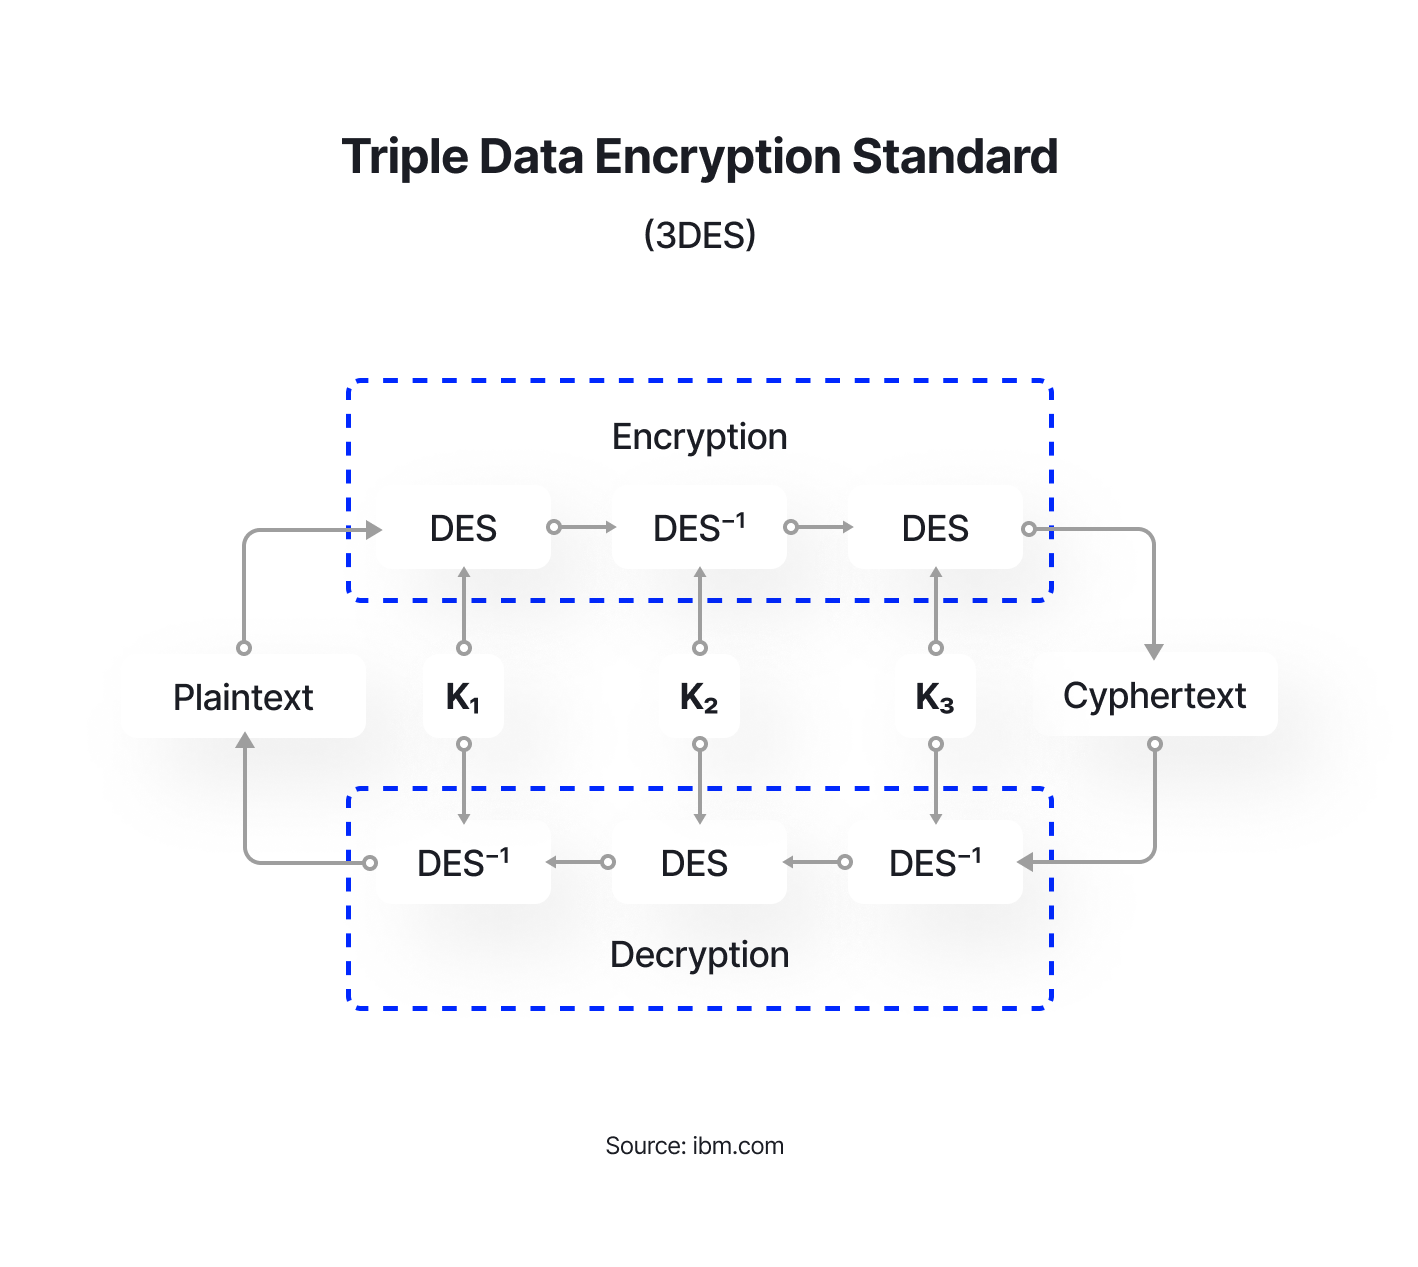 Triple Data Encryption Standard (3DES)